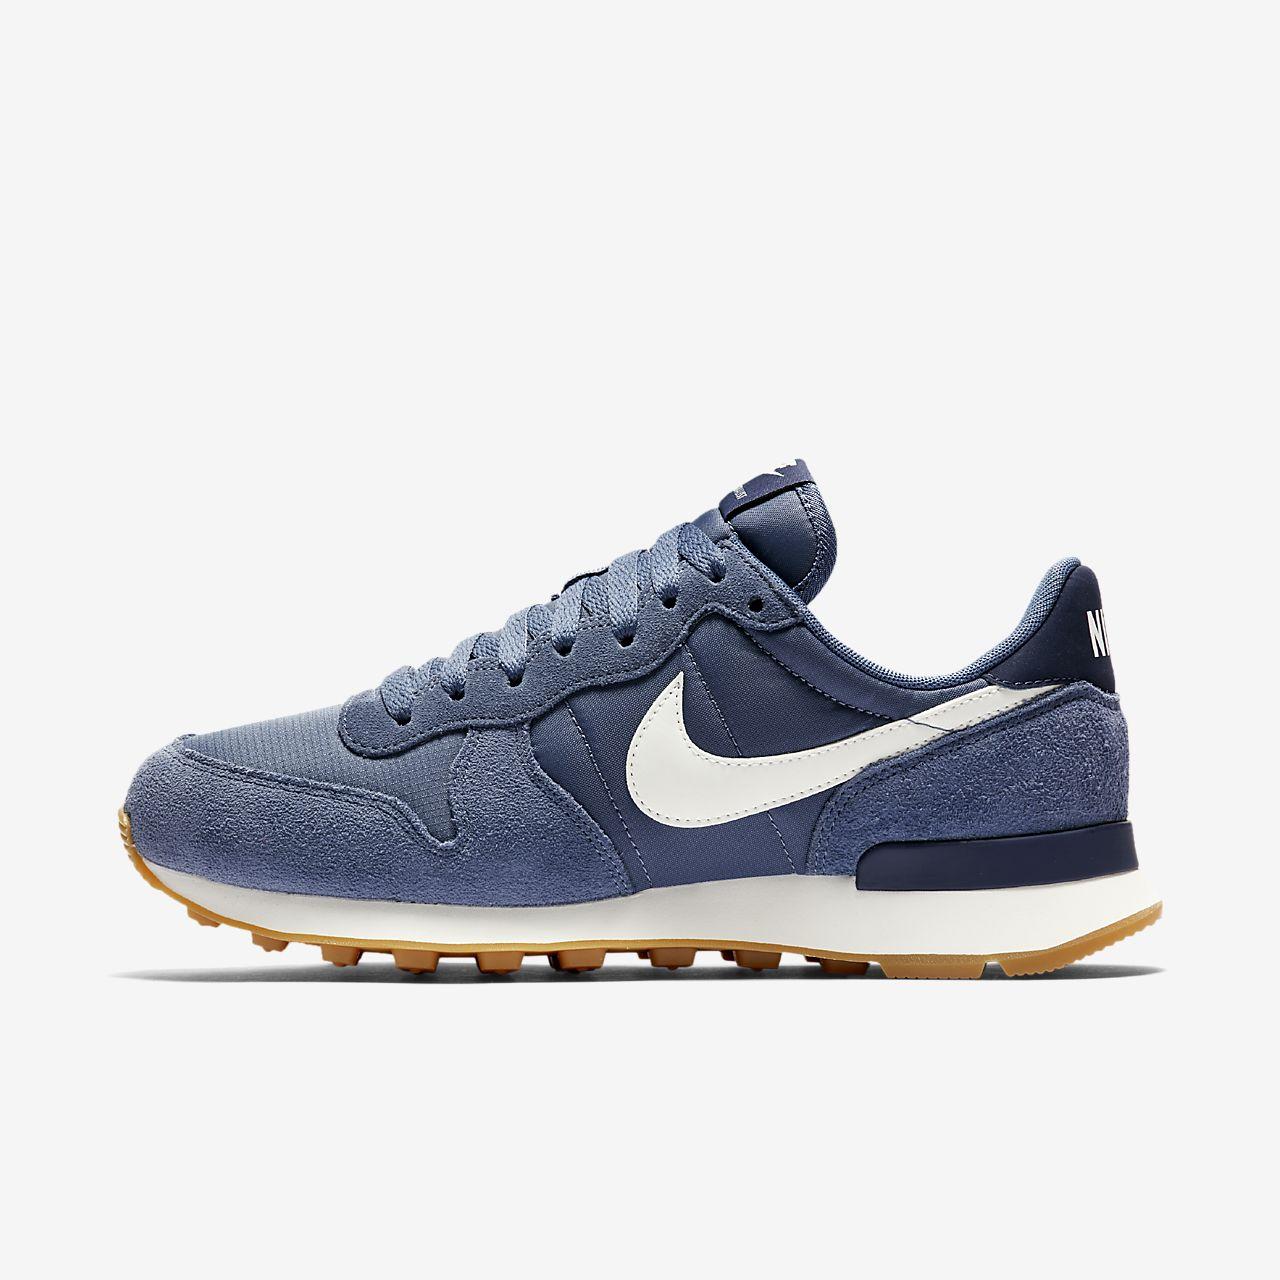 check-out bd1c6 910b3 Nike Internationalist Women's Shoe